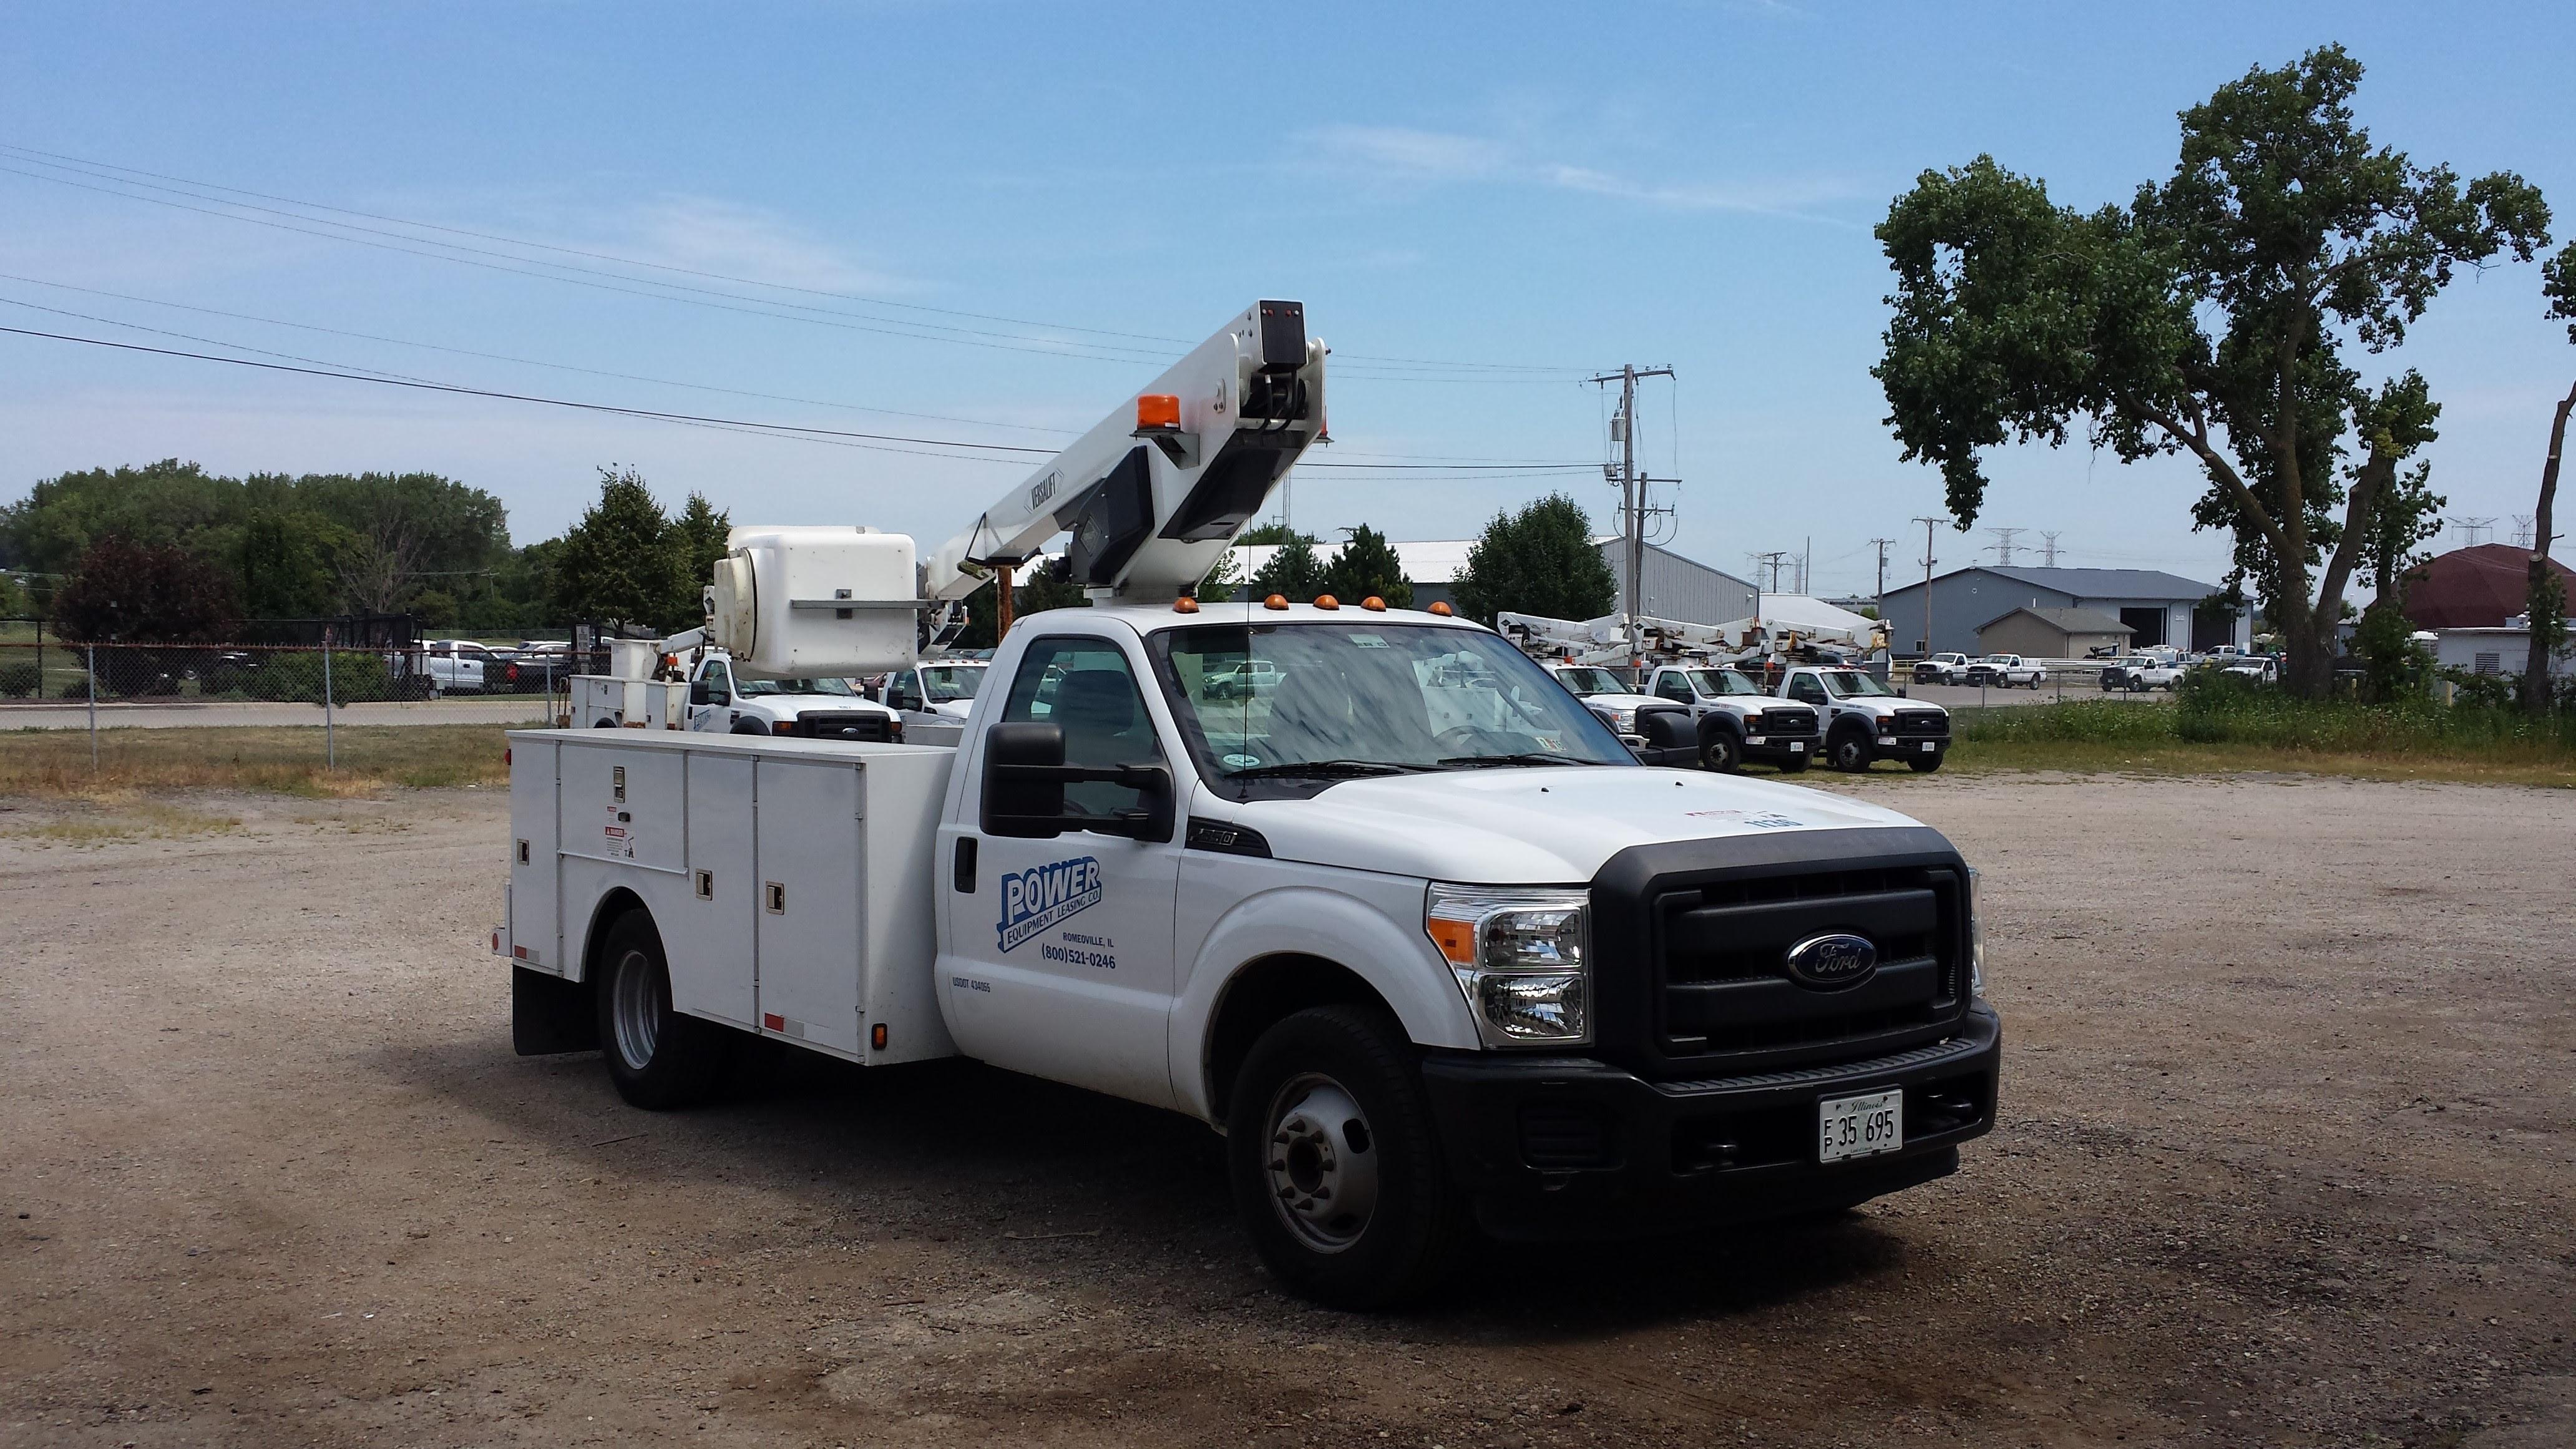 Bucket Lift Truck Rental Rent aerial lifts bucket trucks near